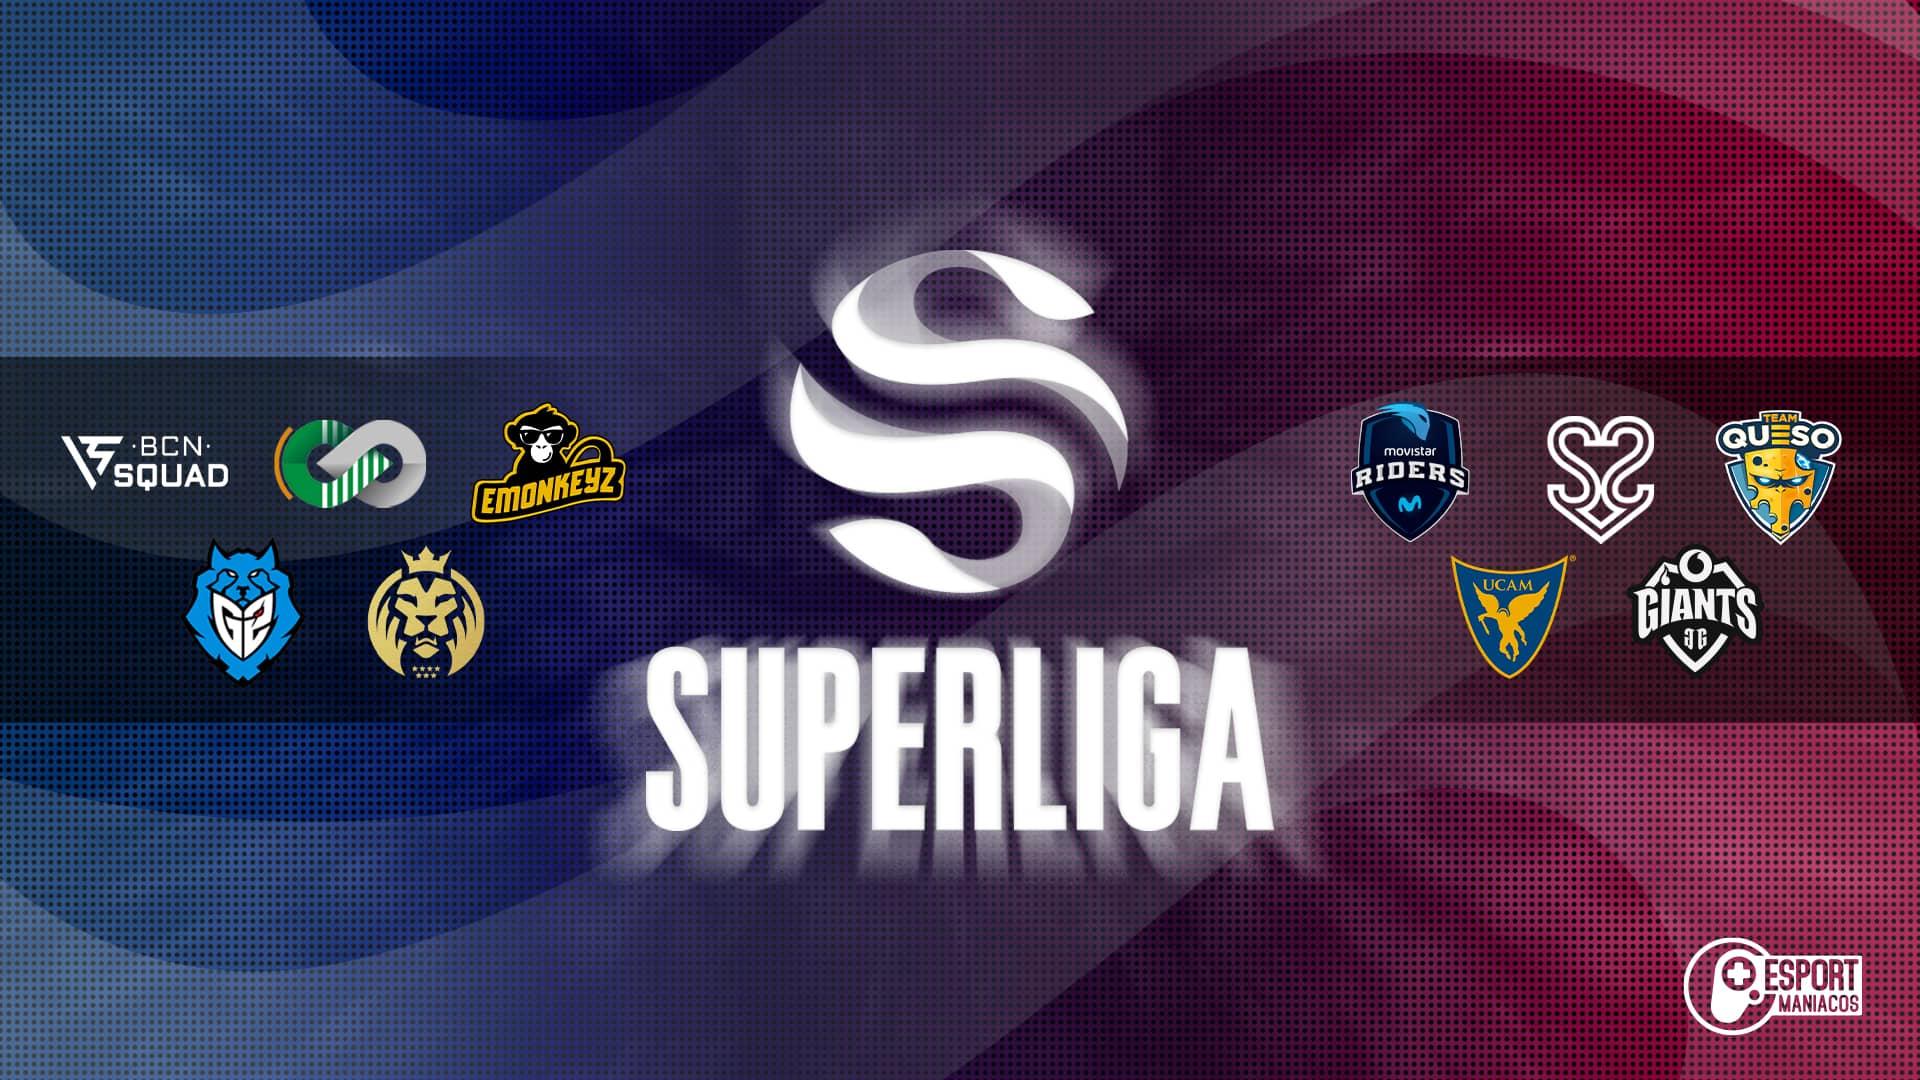 Superliga estreno